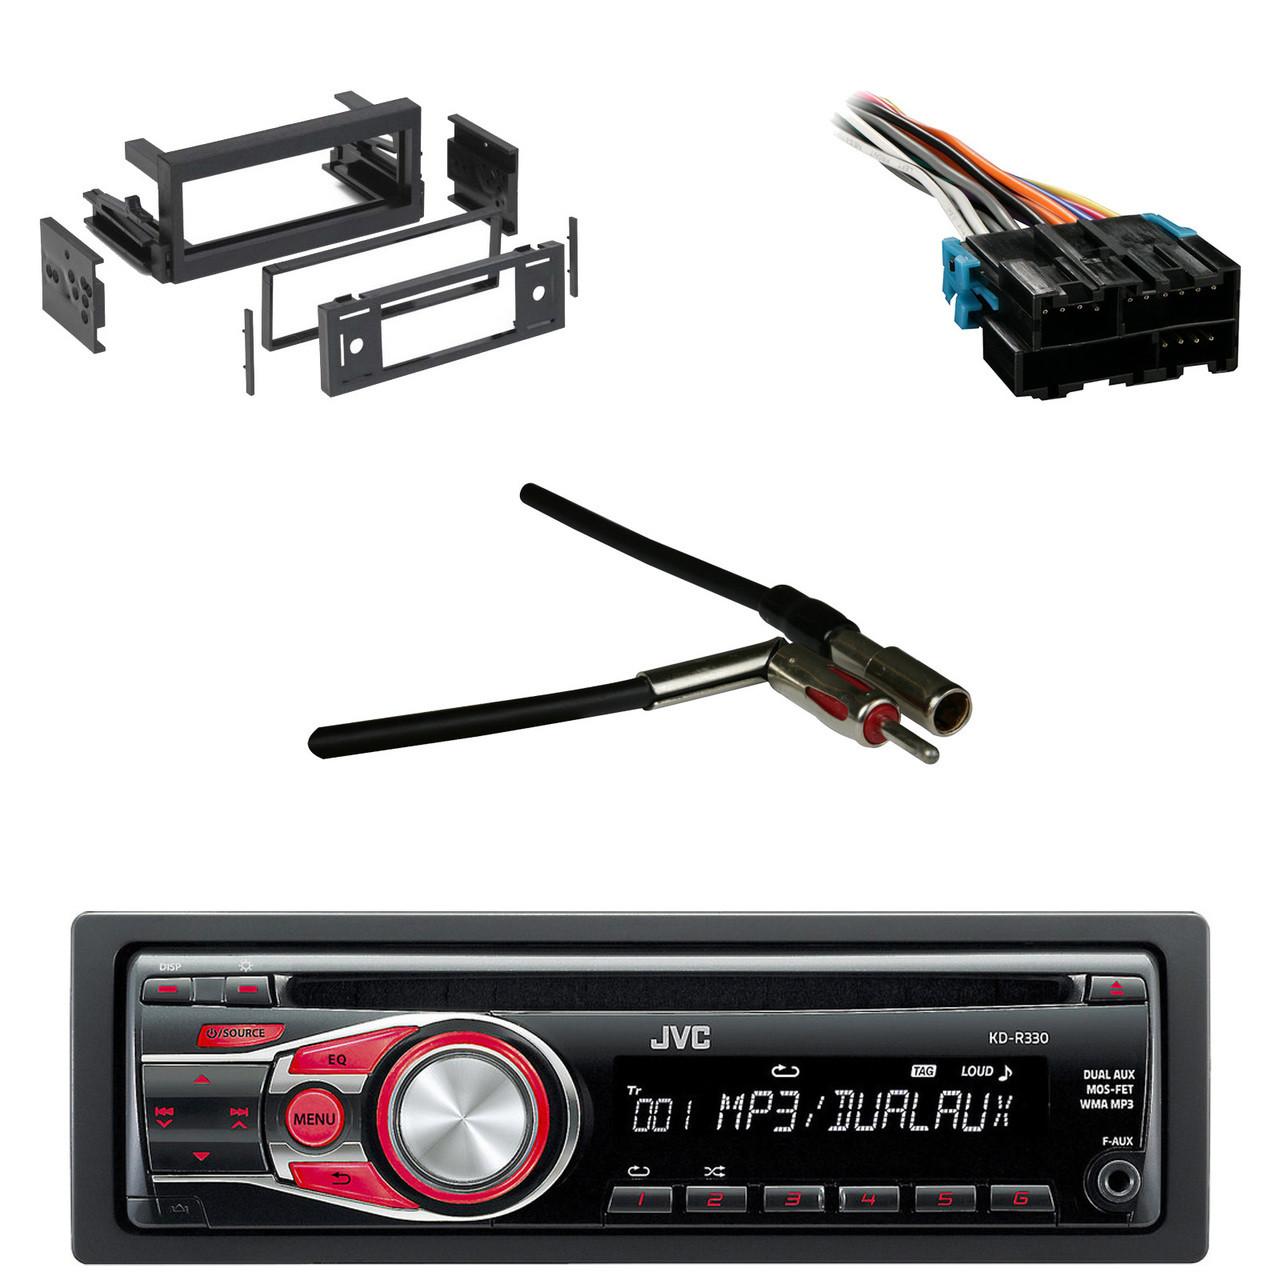 medium resolution of jvc kdr330 cd aux car radio antenn adapter gm wire harness gm rh roadentertainment com wiring